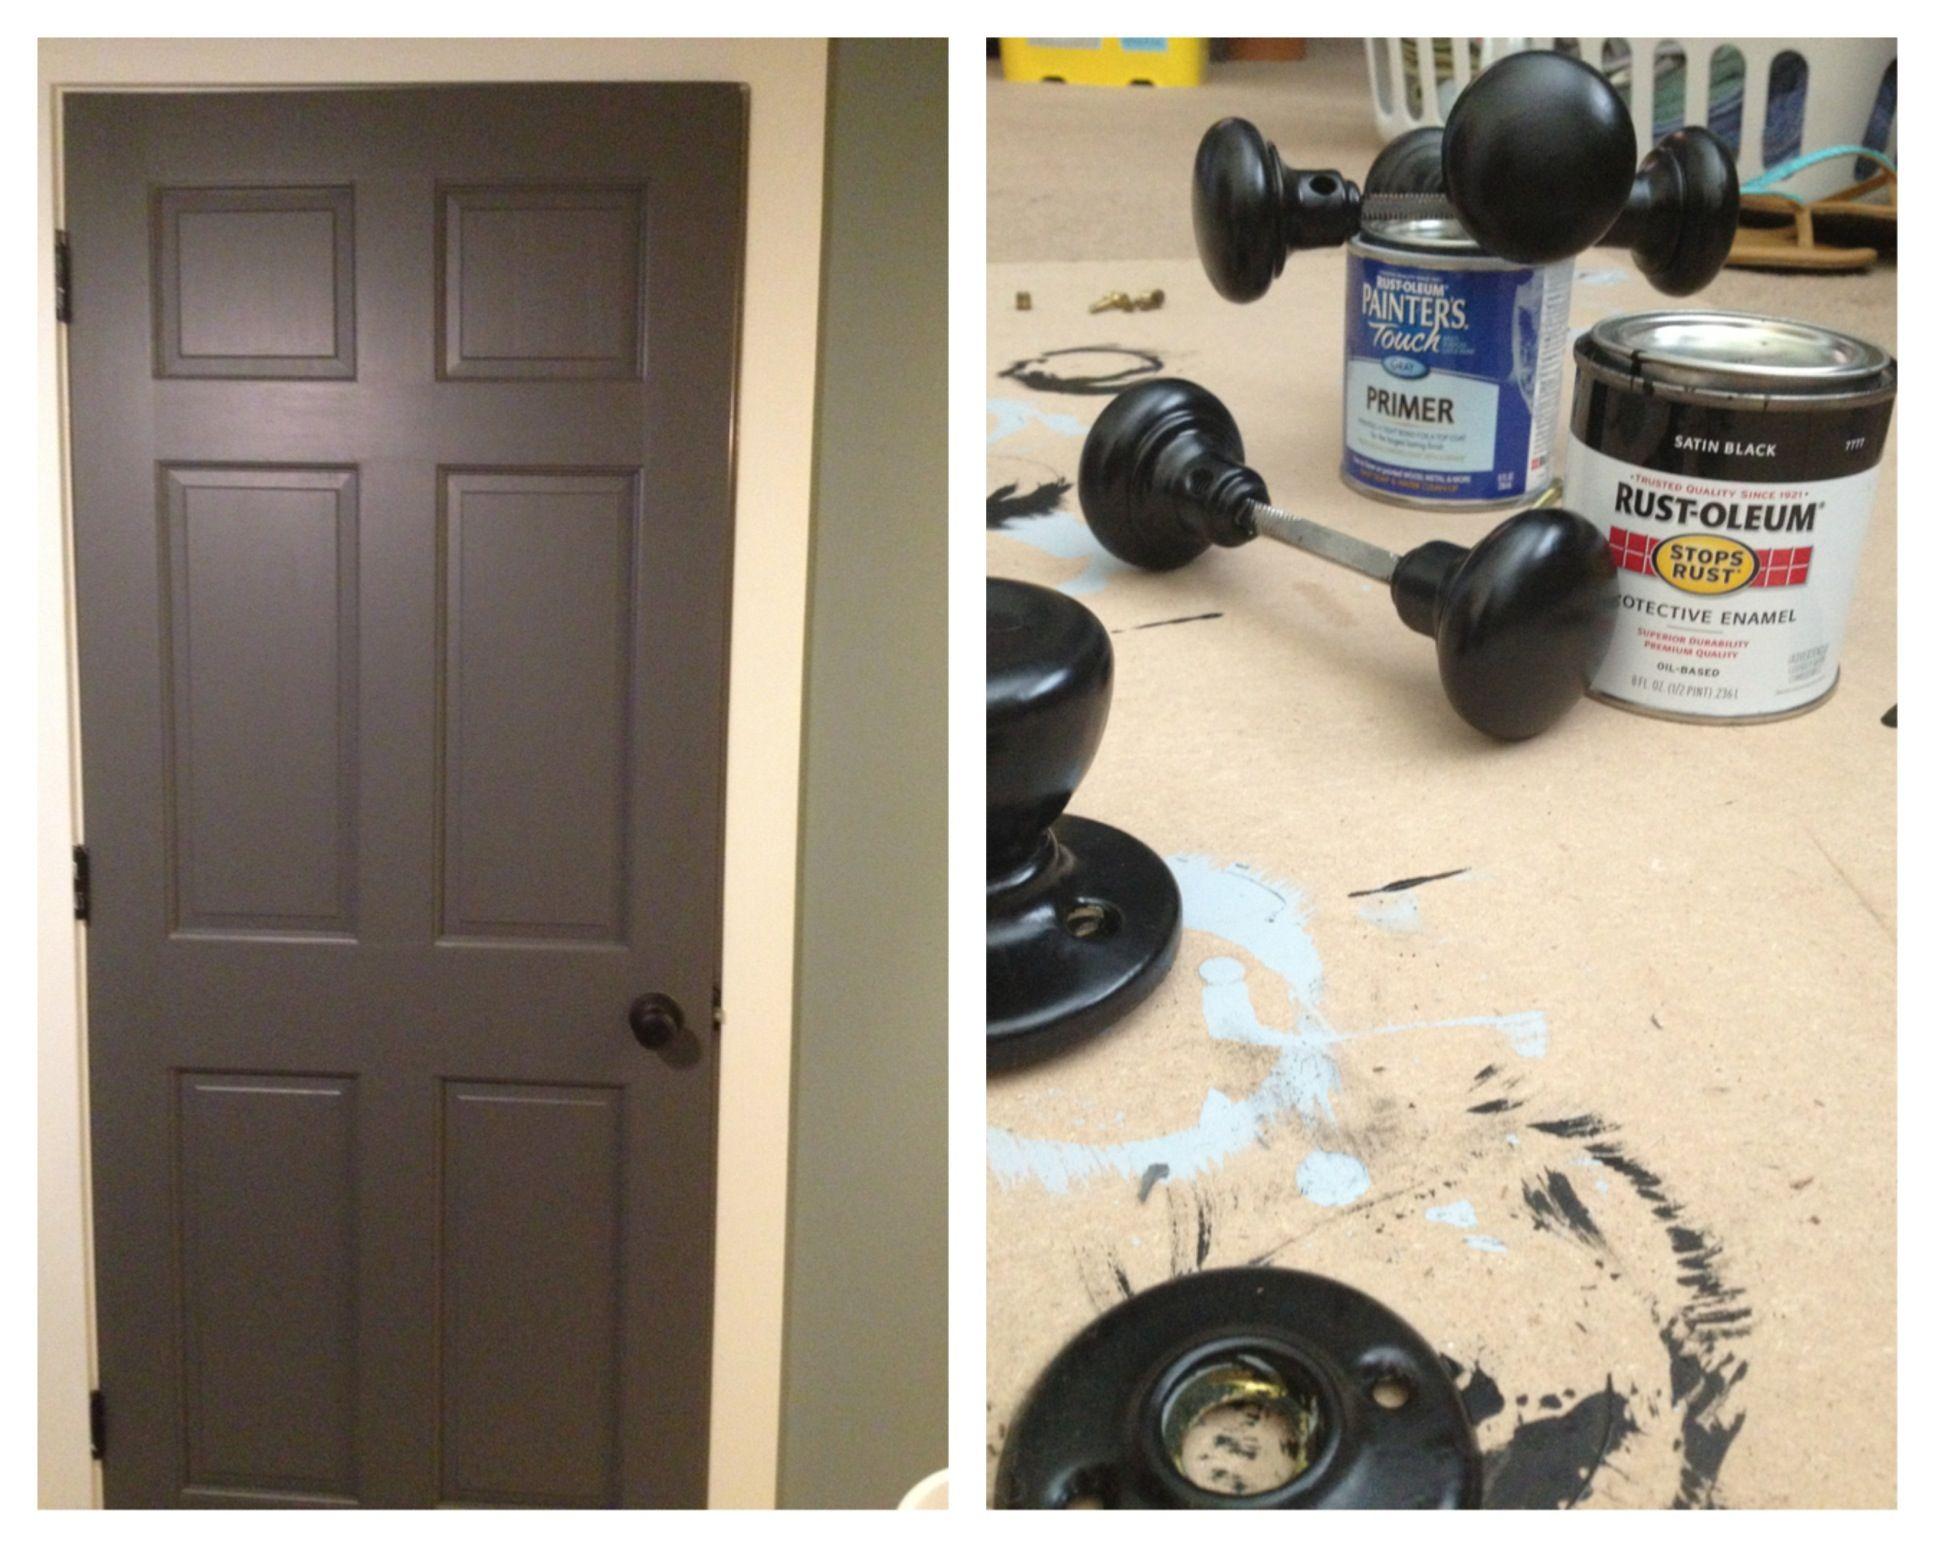 Painted All Interior Doors Dark Kept Trim Light Old Br Door S Black Used Benjamin Moore Kendall Charcoal Pearl Finish On